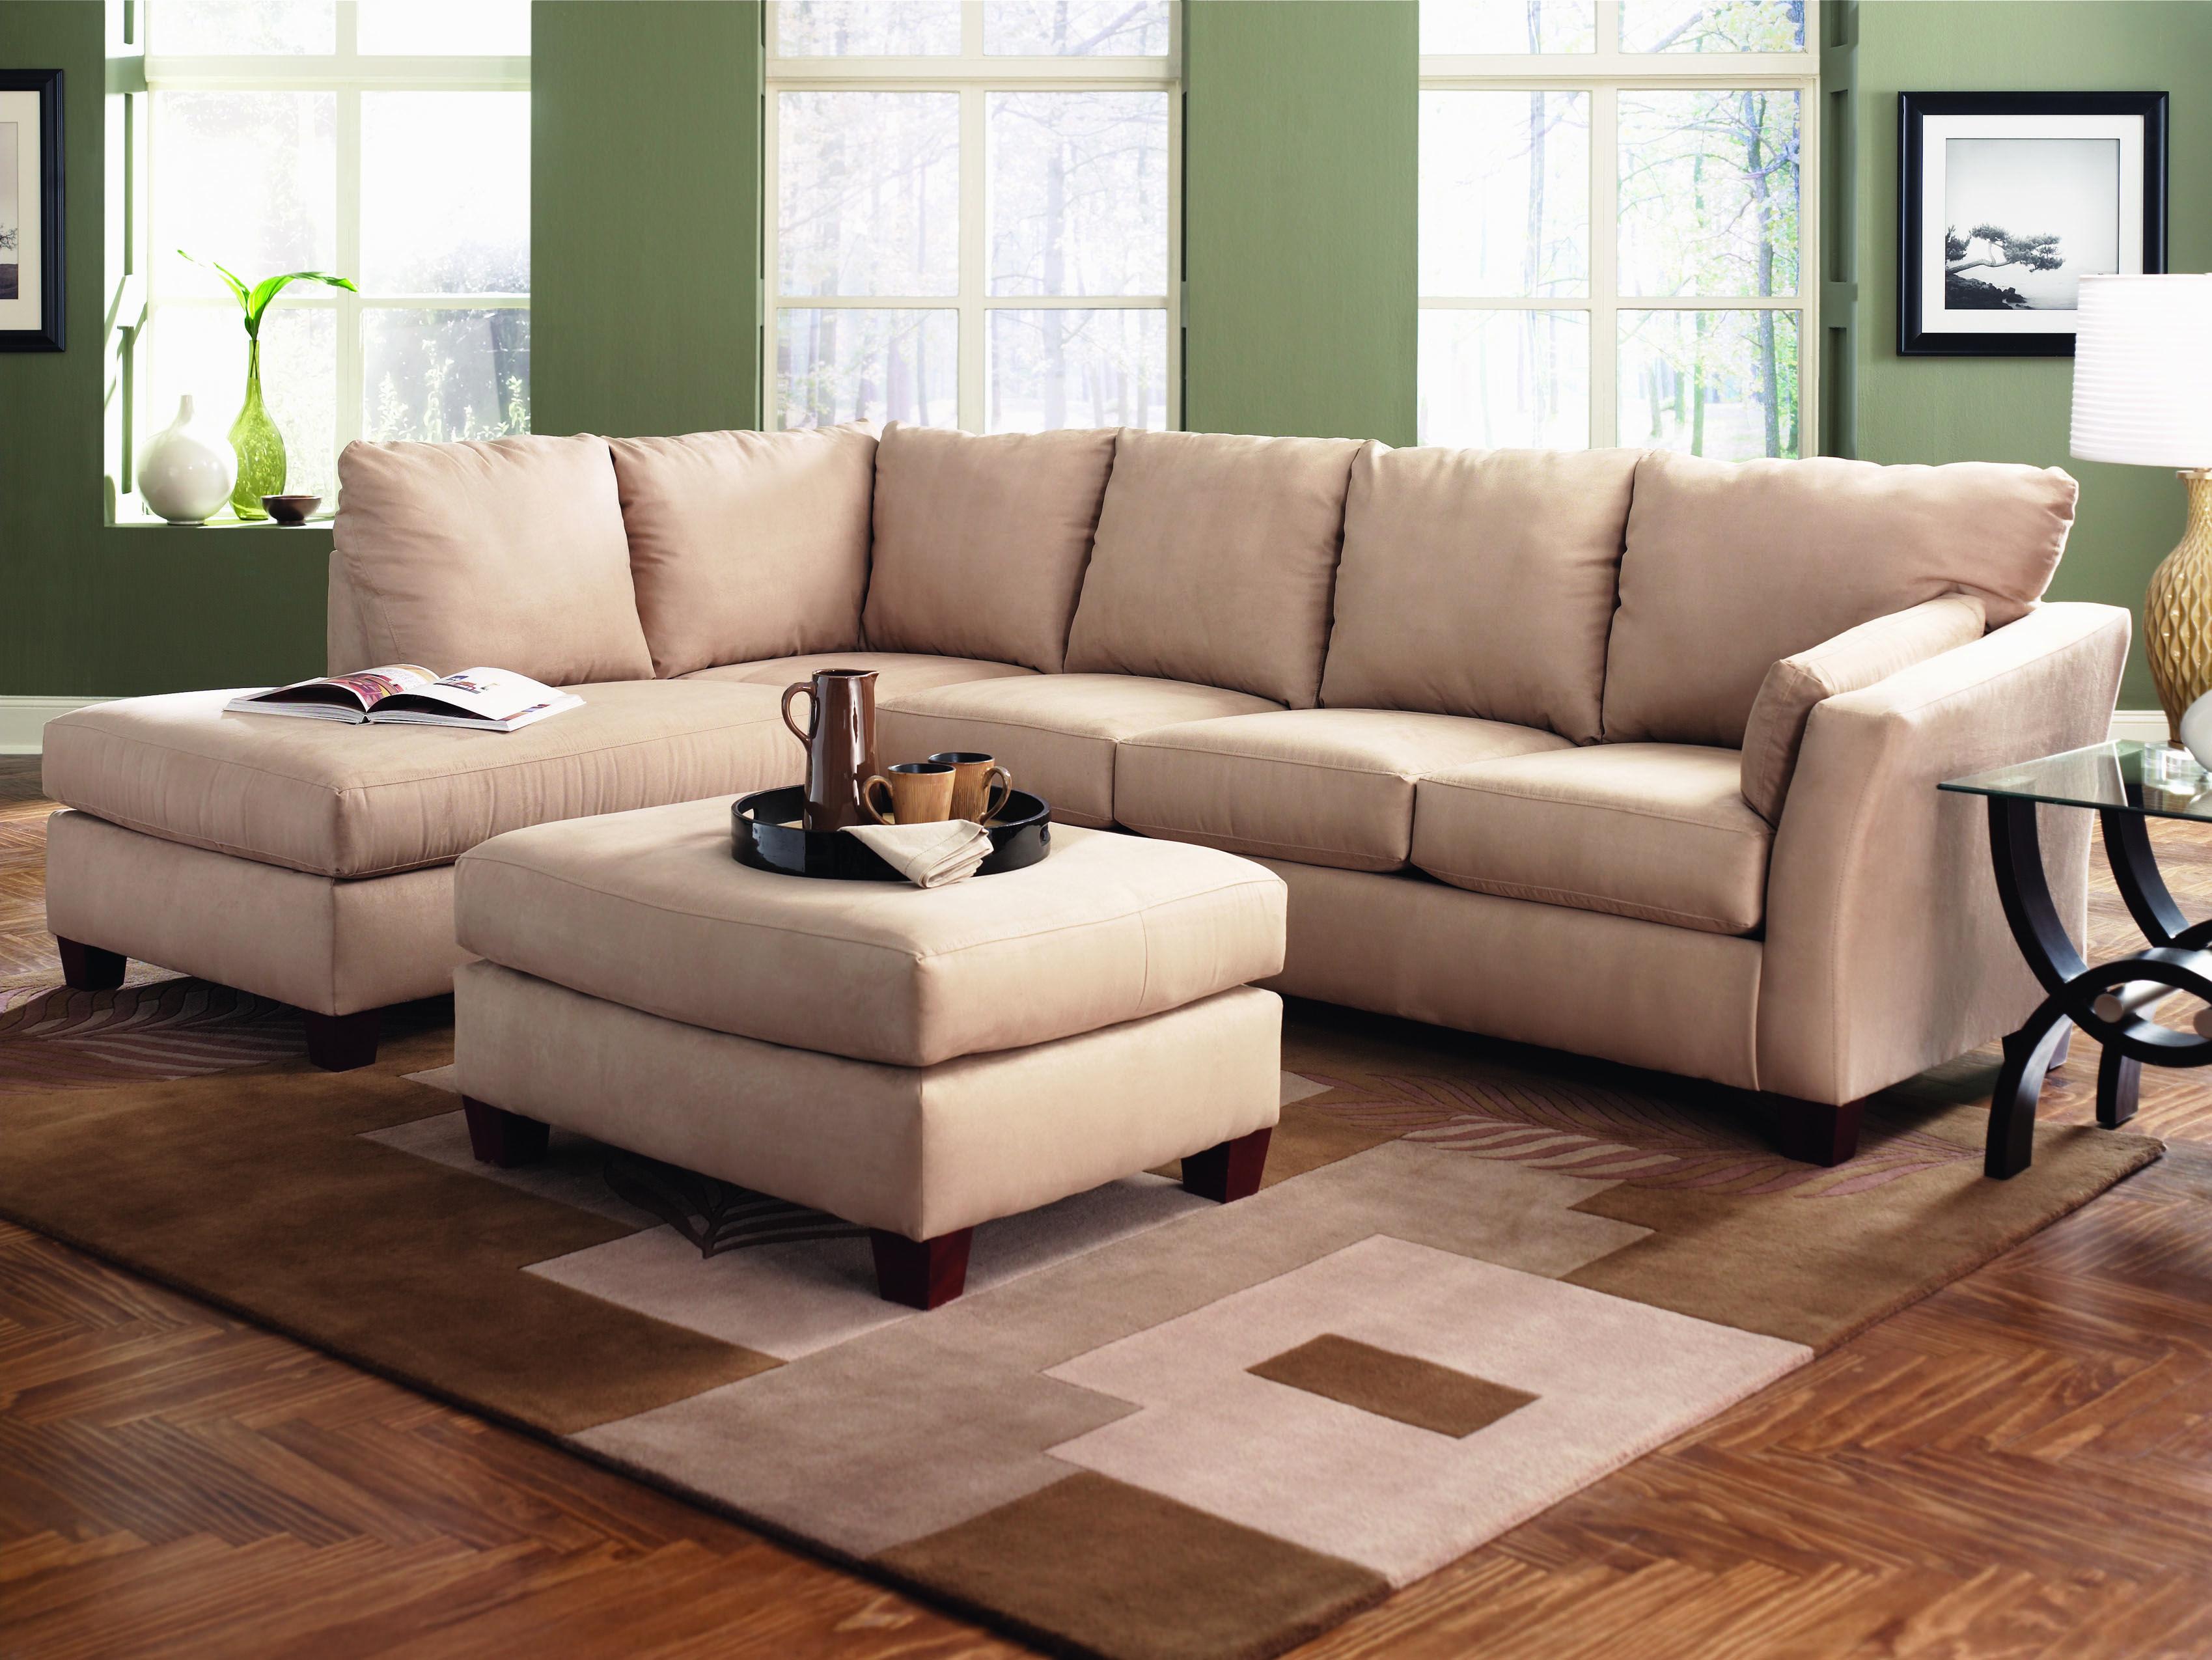 Living bachman furniture toby bachman furniture